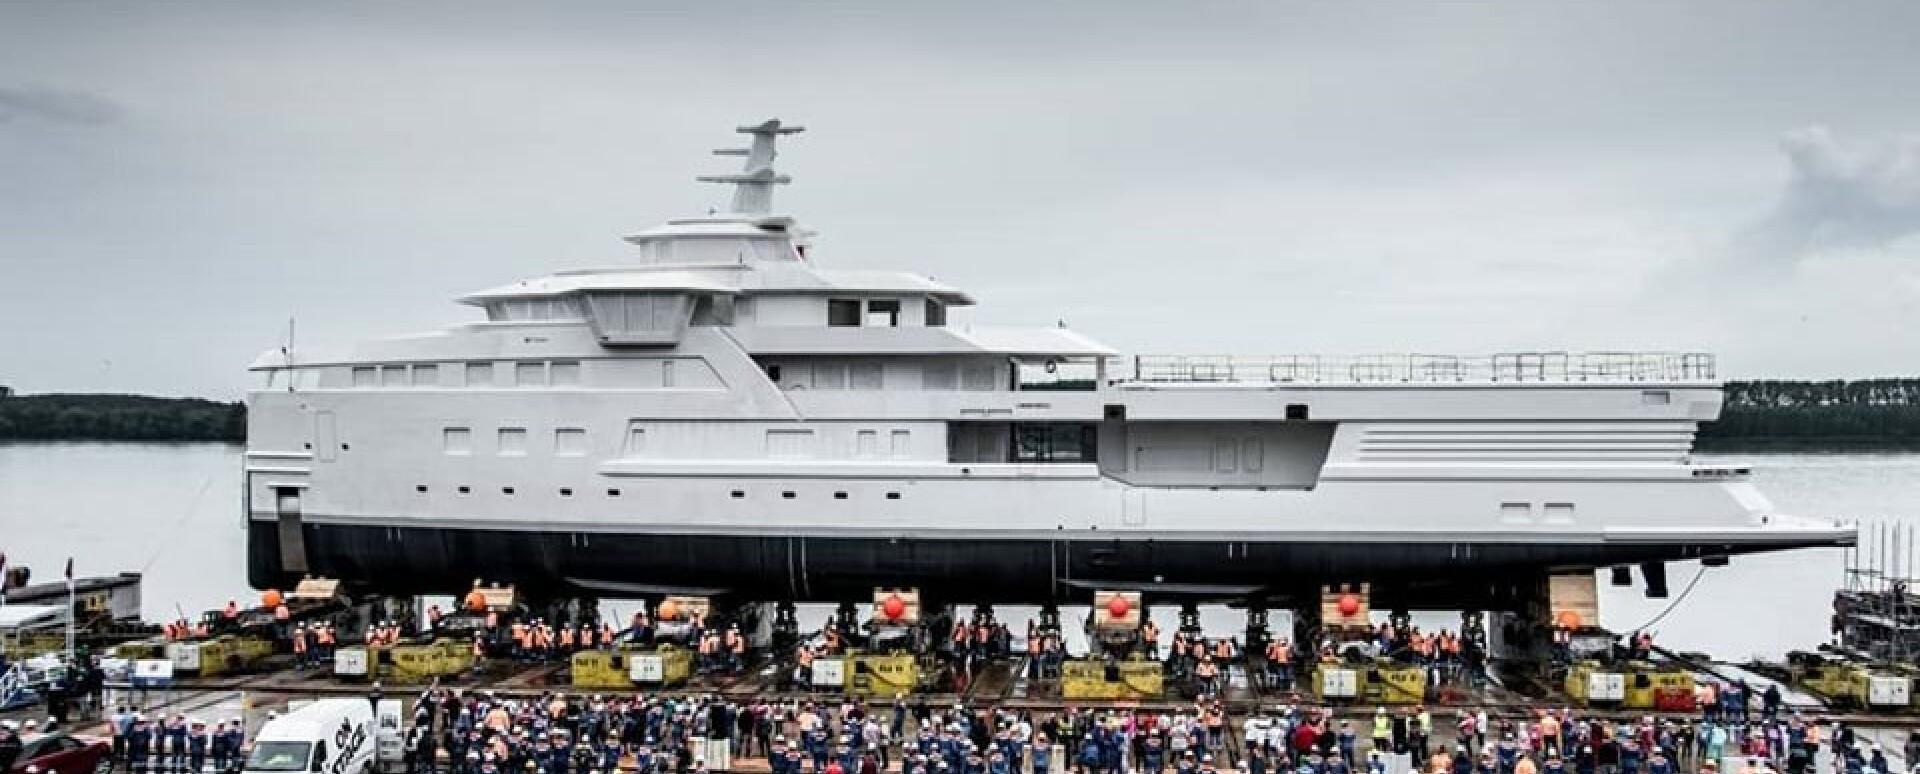 Damen launches hull of SeaXplorer 77 M/Y La Datcha